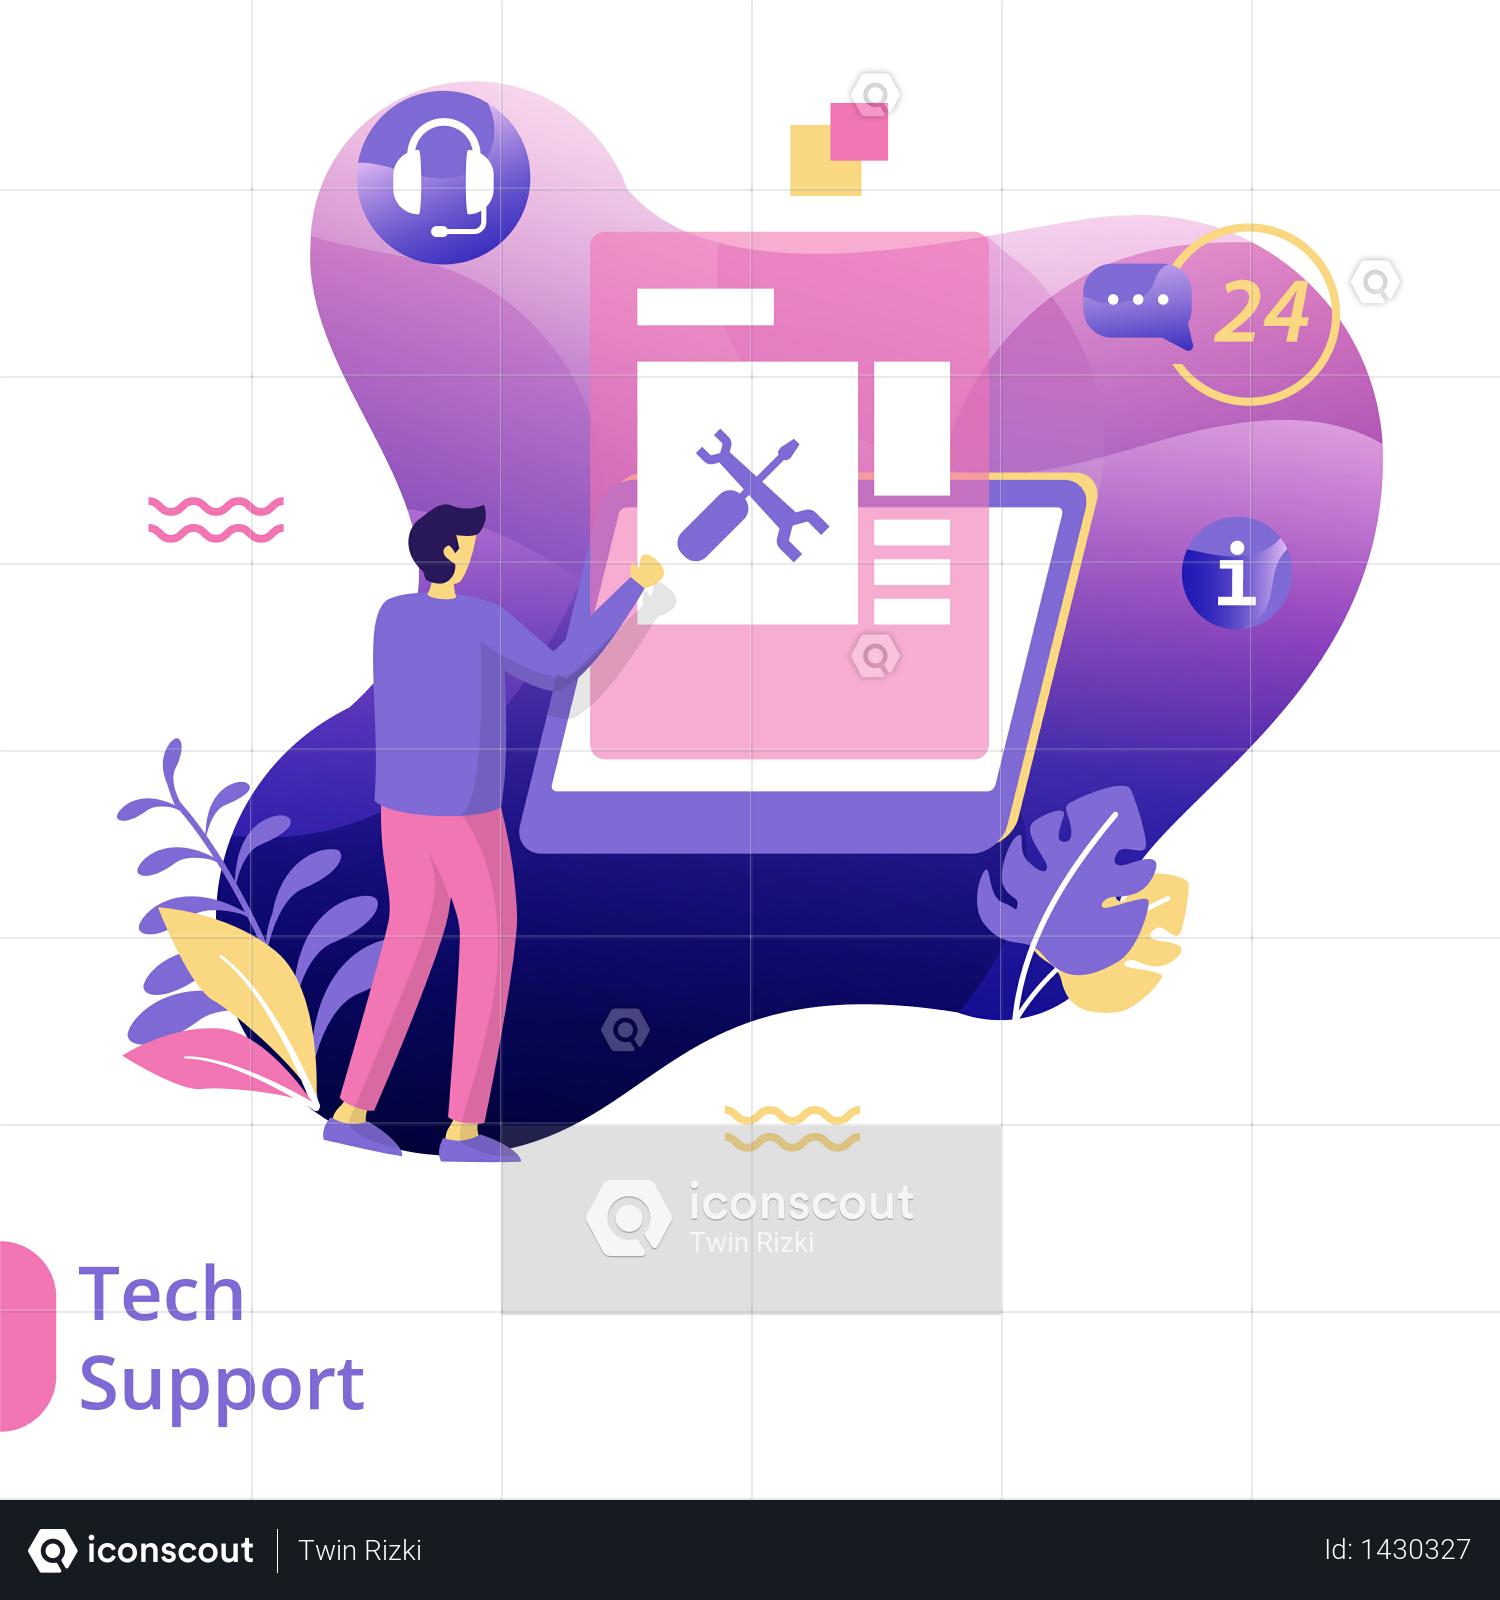 Flat Illustration Of Tech Support Illustration Support Illustration Communication Illustration Flat Illustration